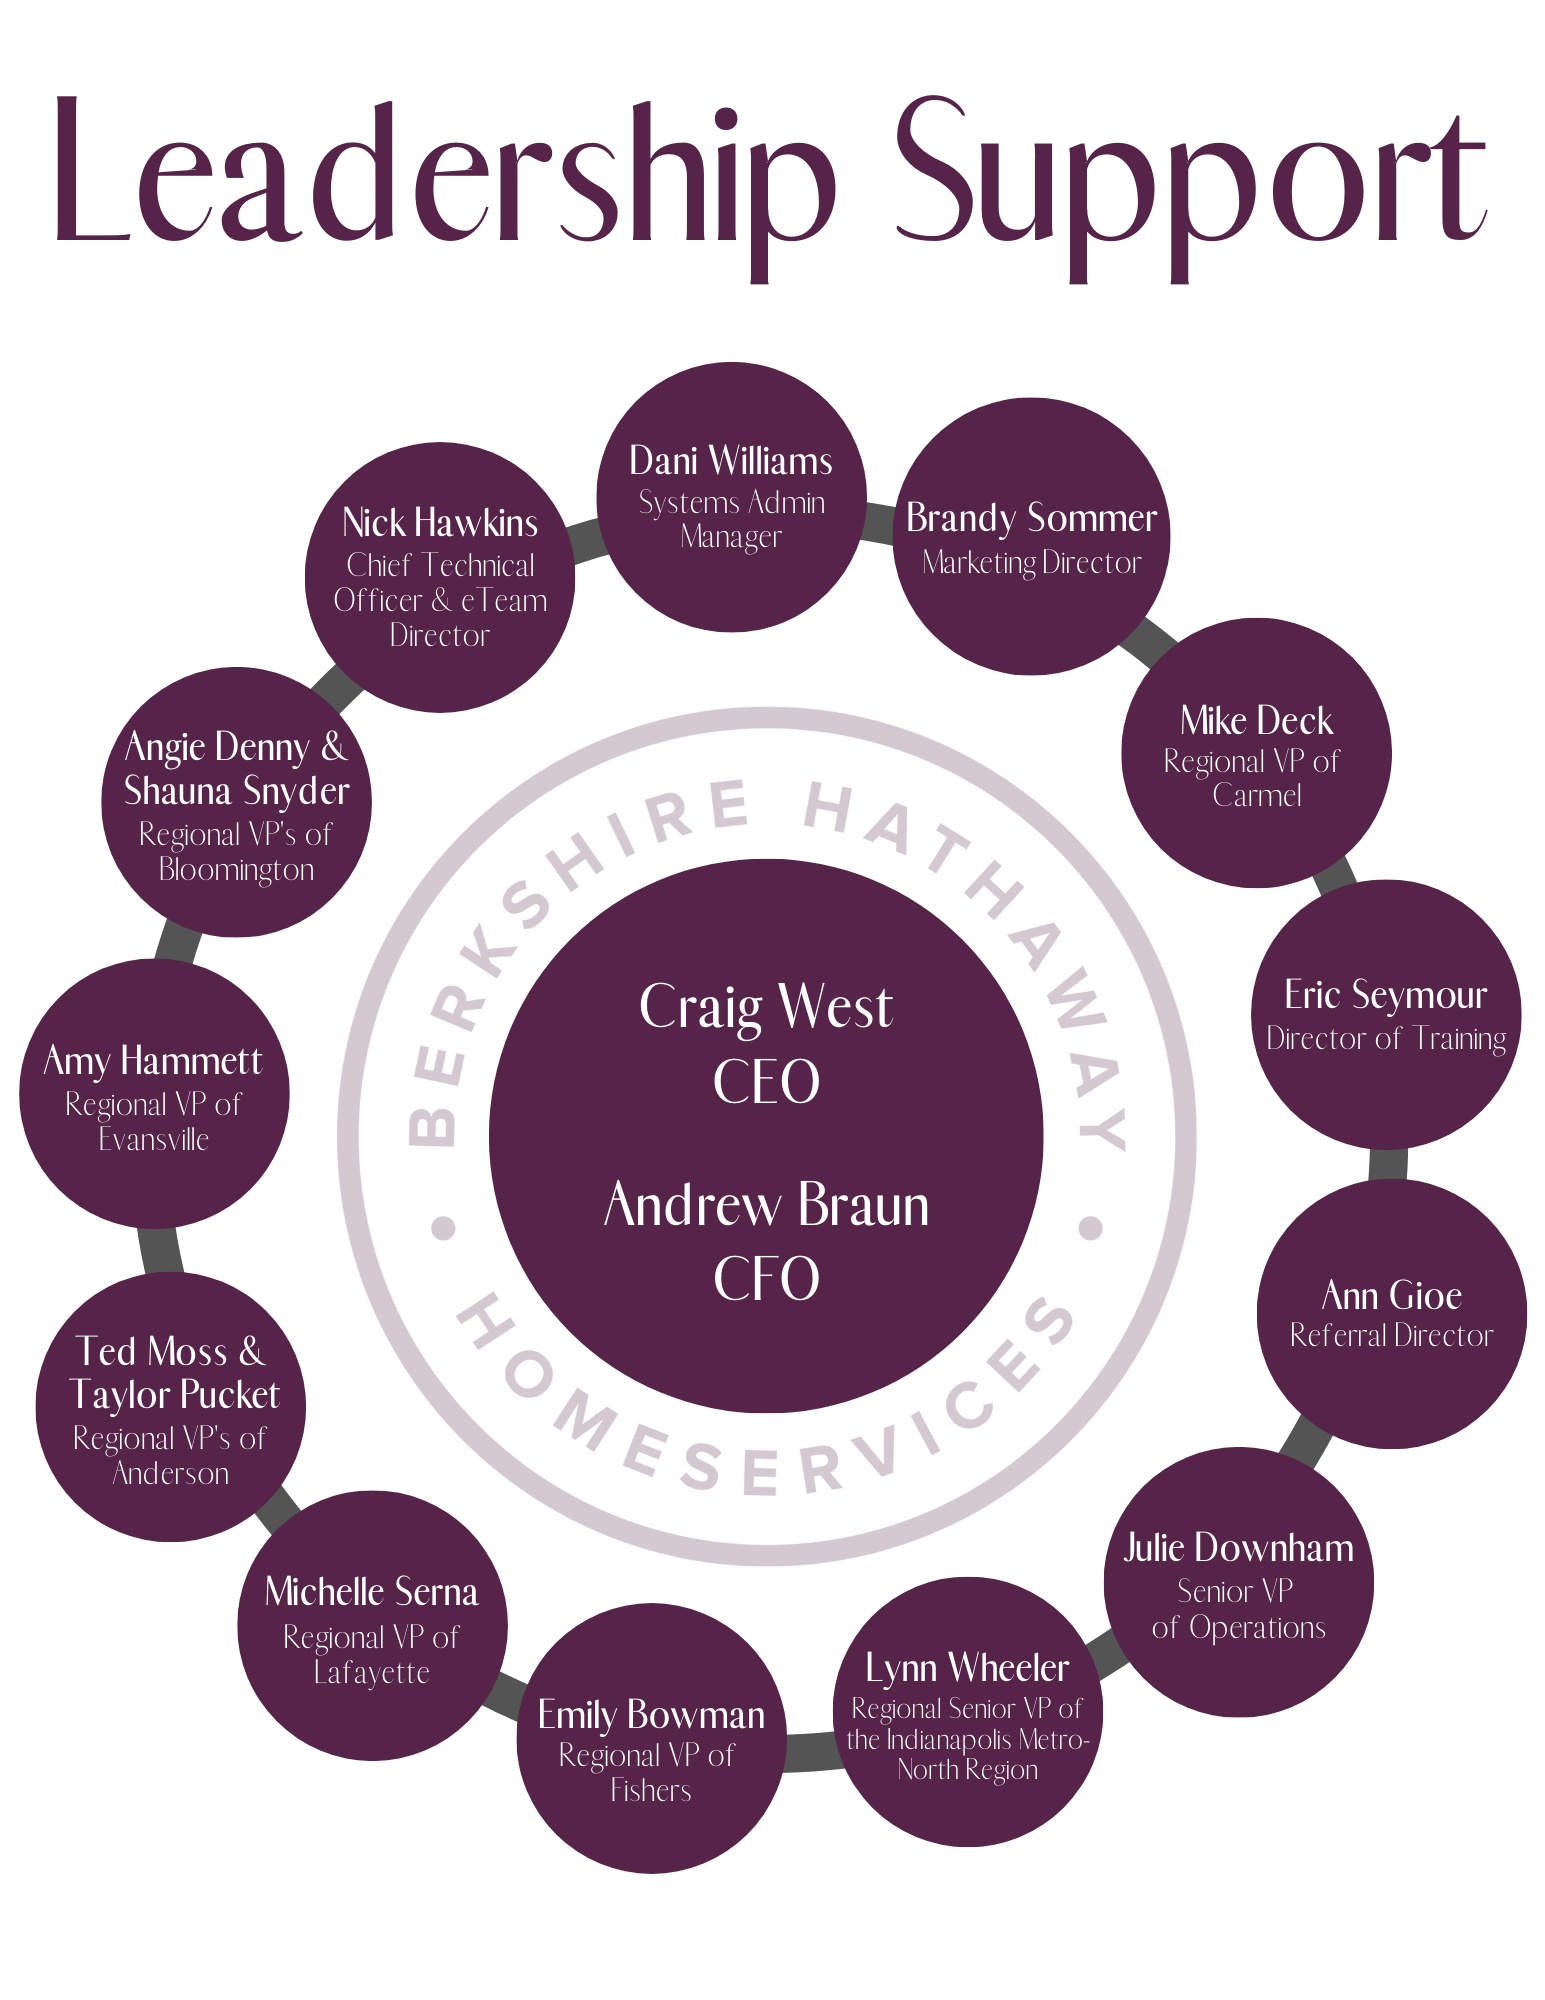 Leadership Support - Moxi Graphic